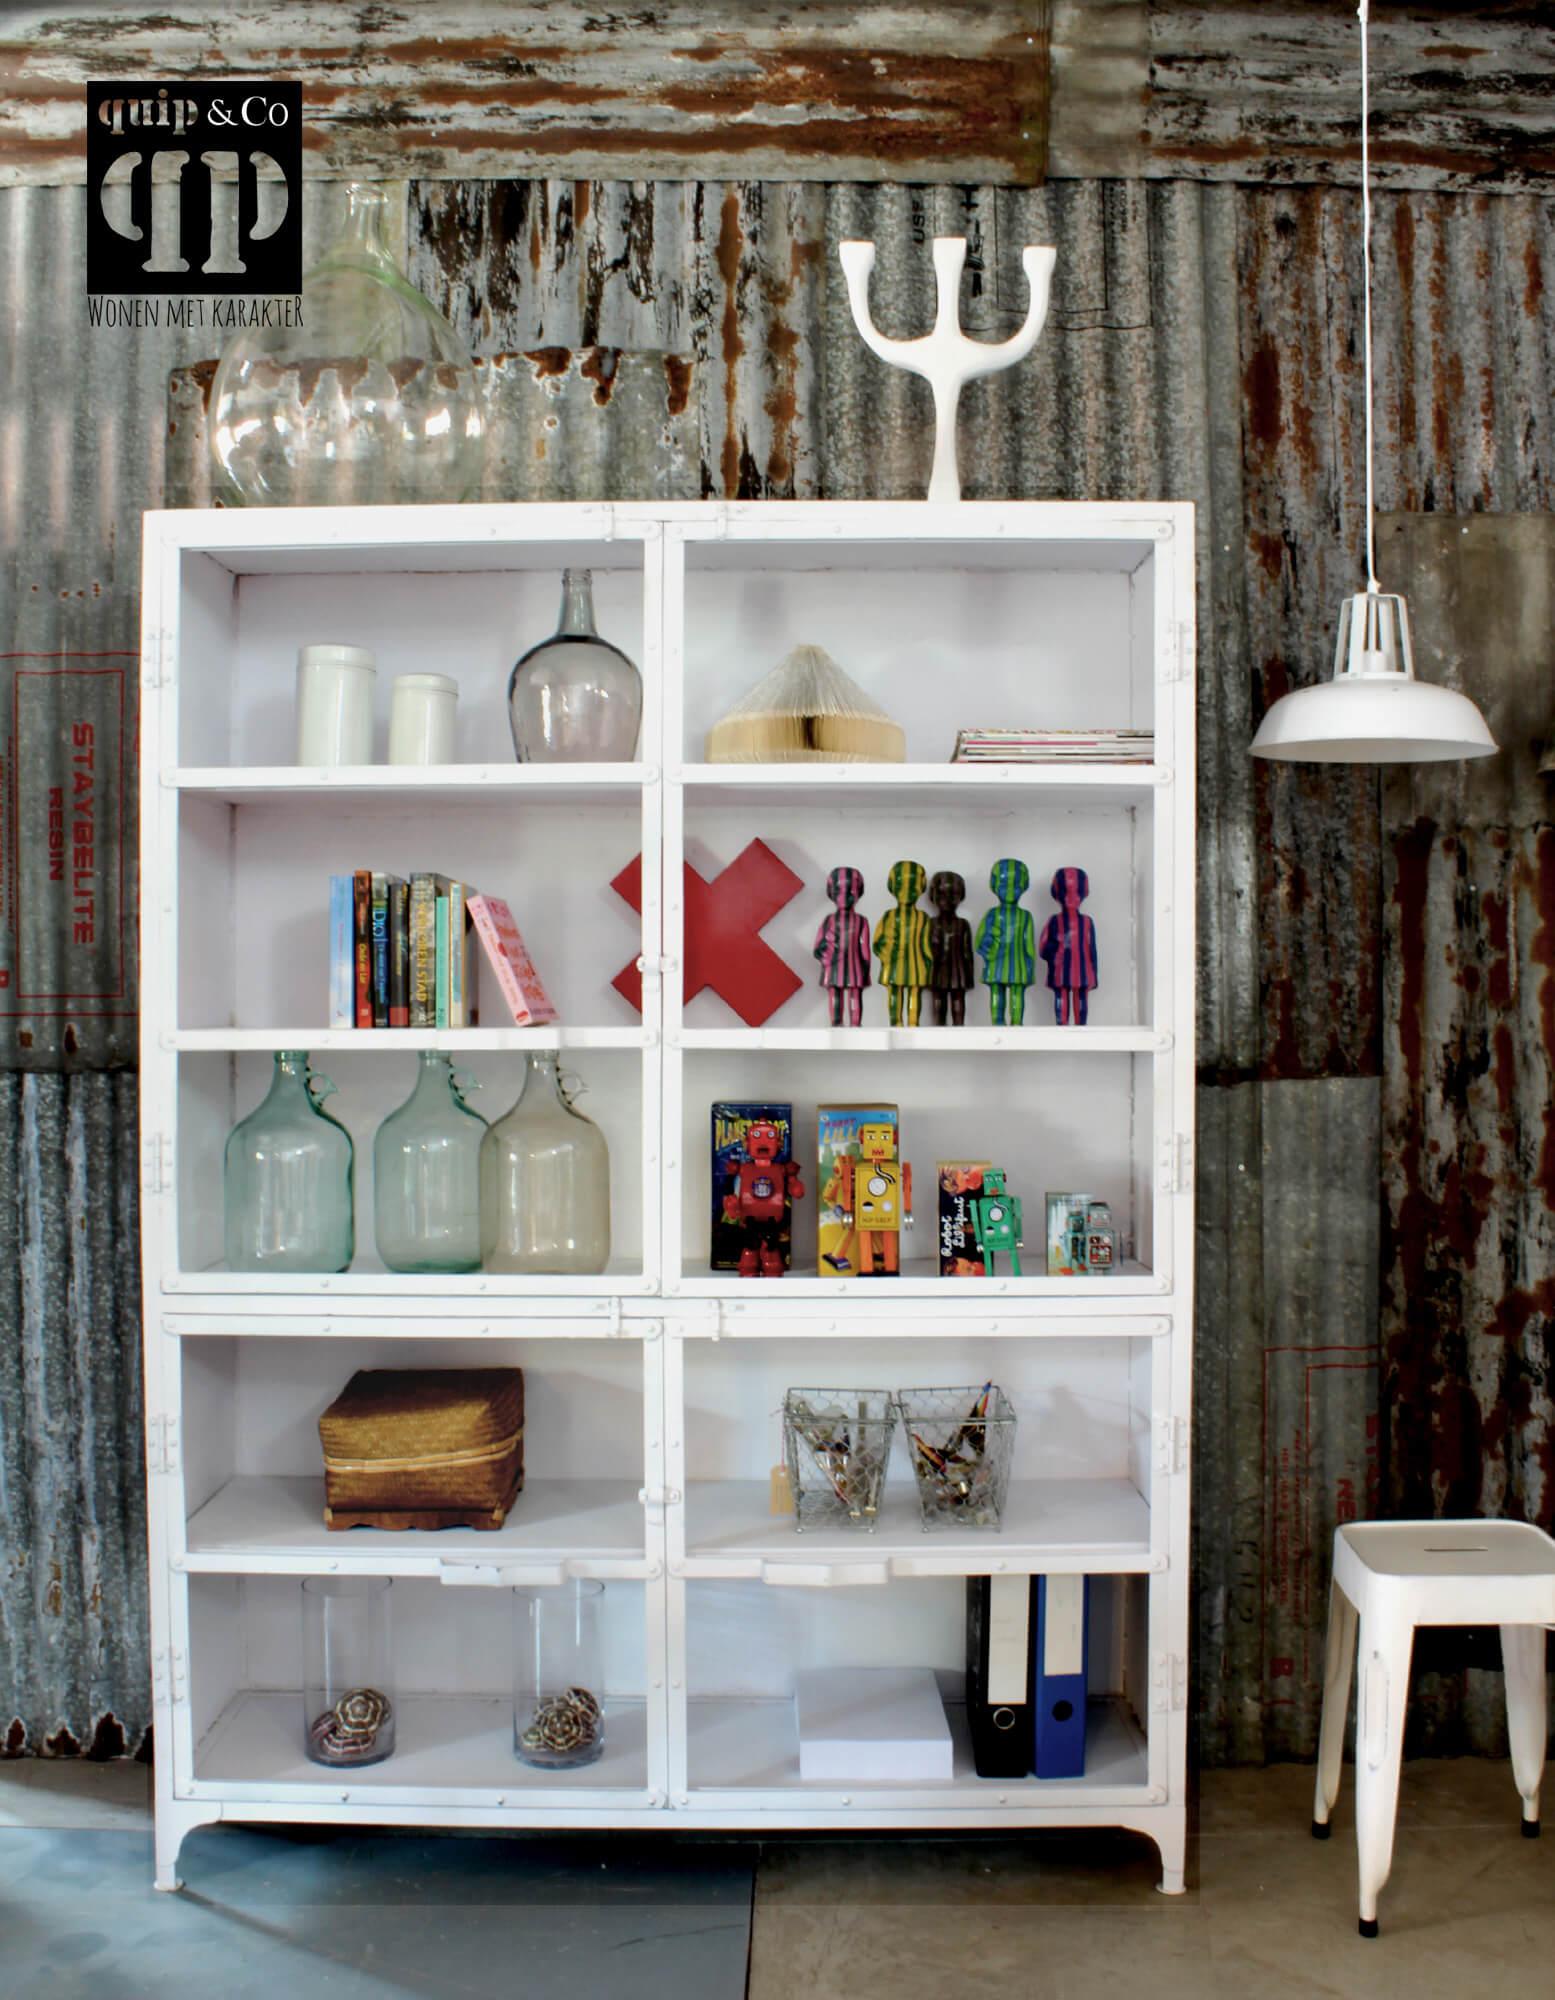 K003w Grote industriële kast met vitrine deuren, marlisa giga meubel, van quip&Co